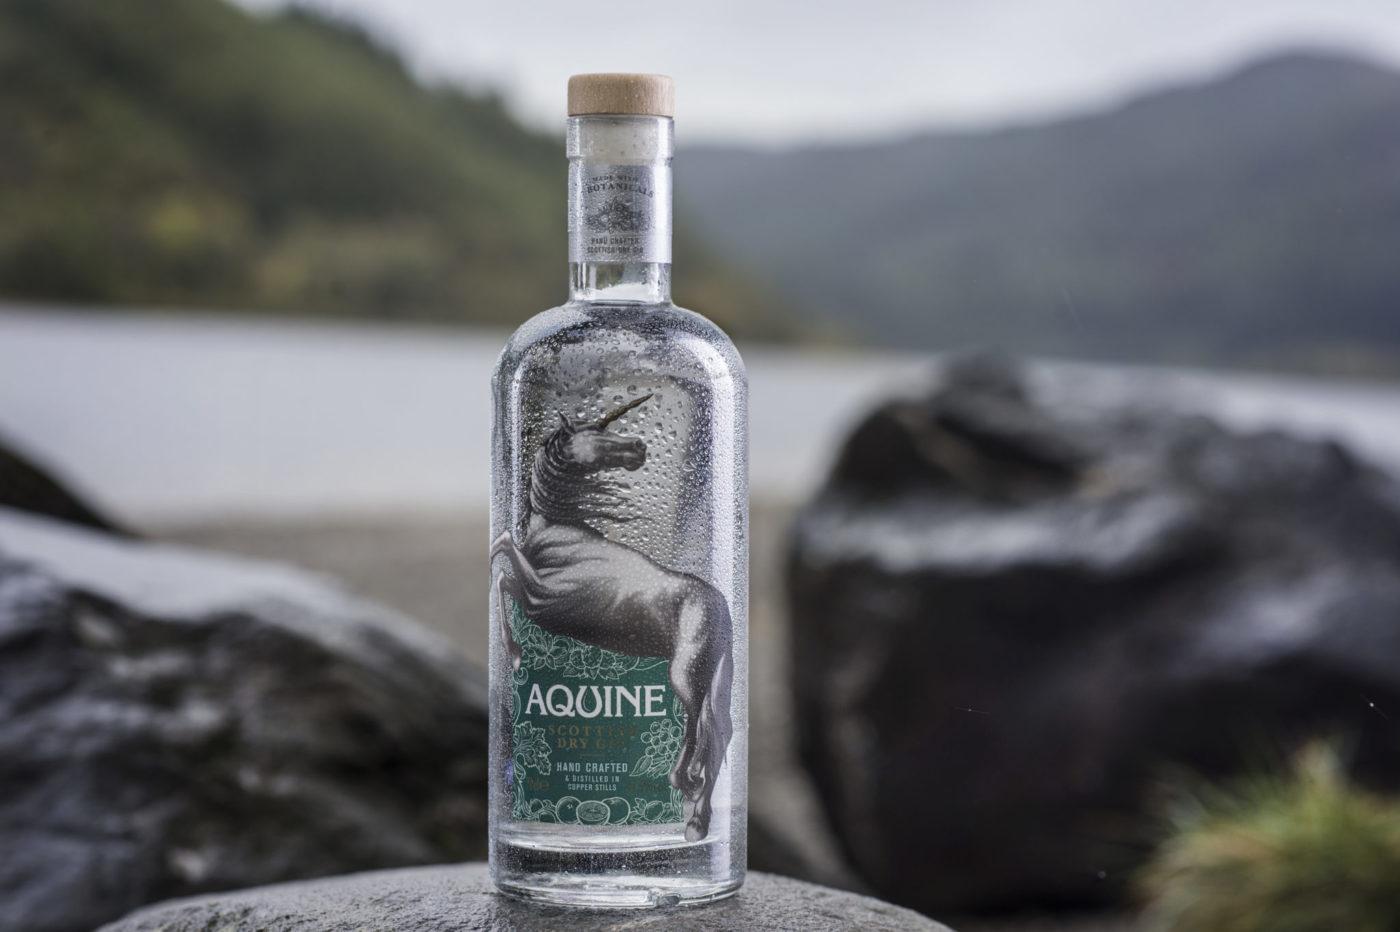 Lidl launches unicorn-inspired Aquine gin